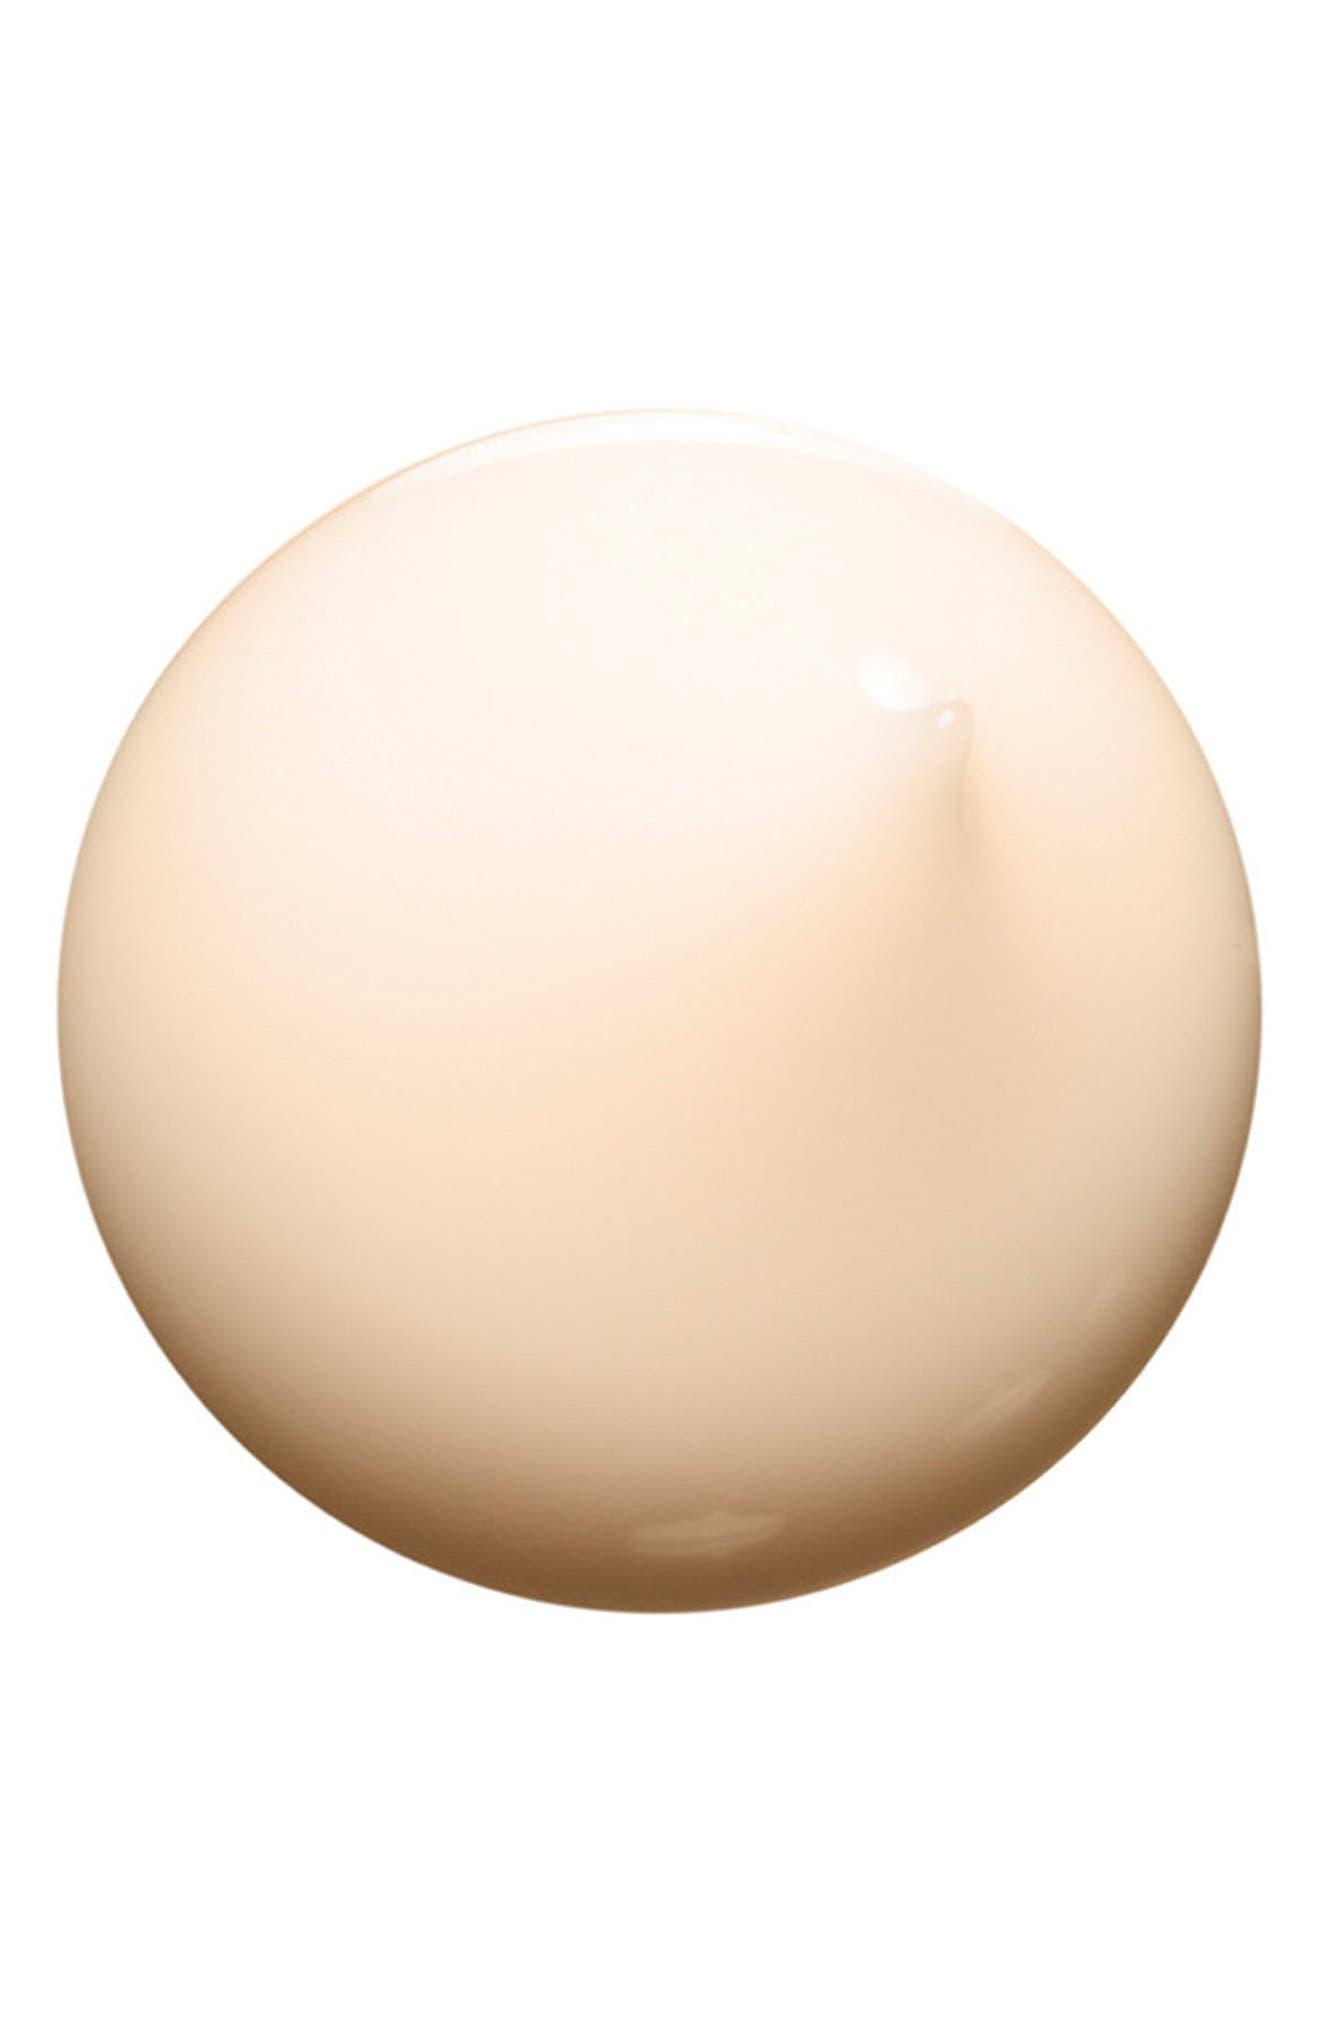 Super Restorative Redefining Body Care Cream for Abdomen and Waist,                             Alternate thumbnail 2, color,                             NO COLOR